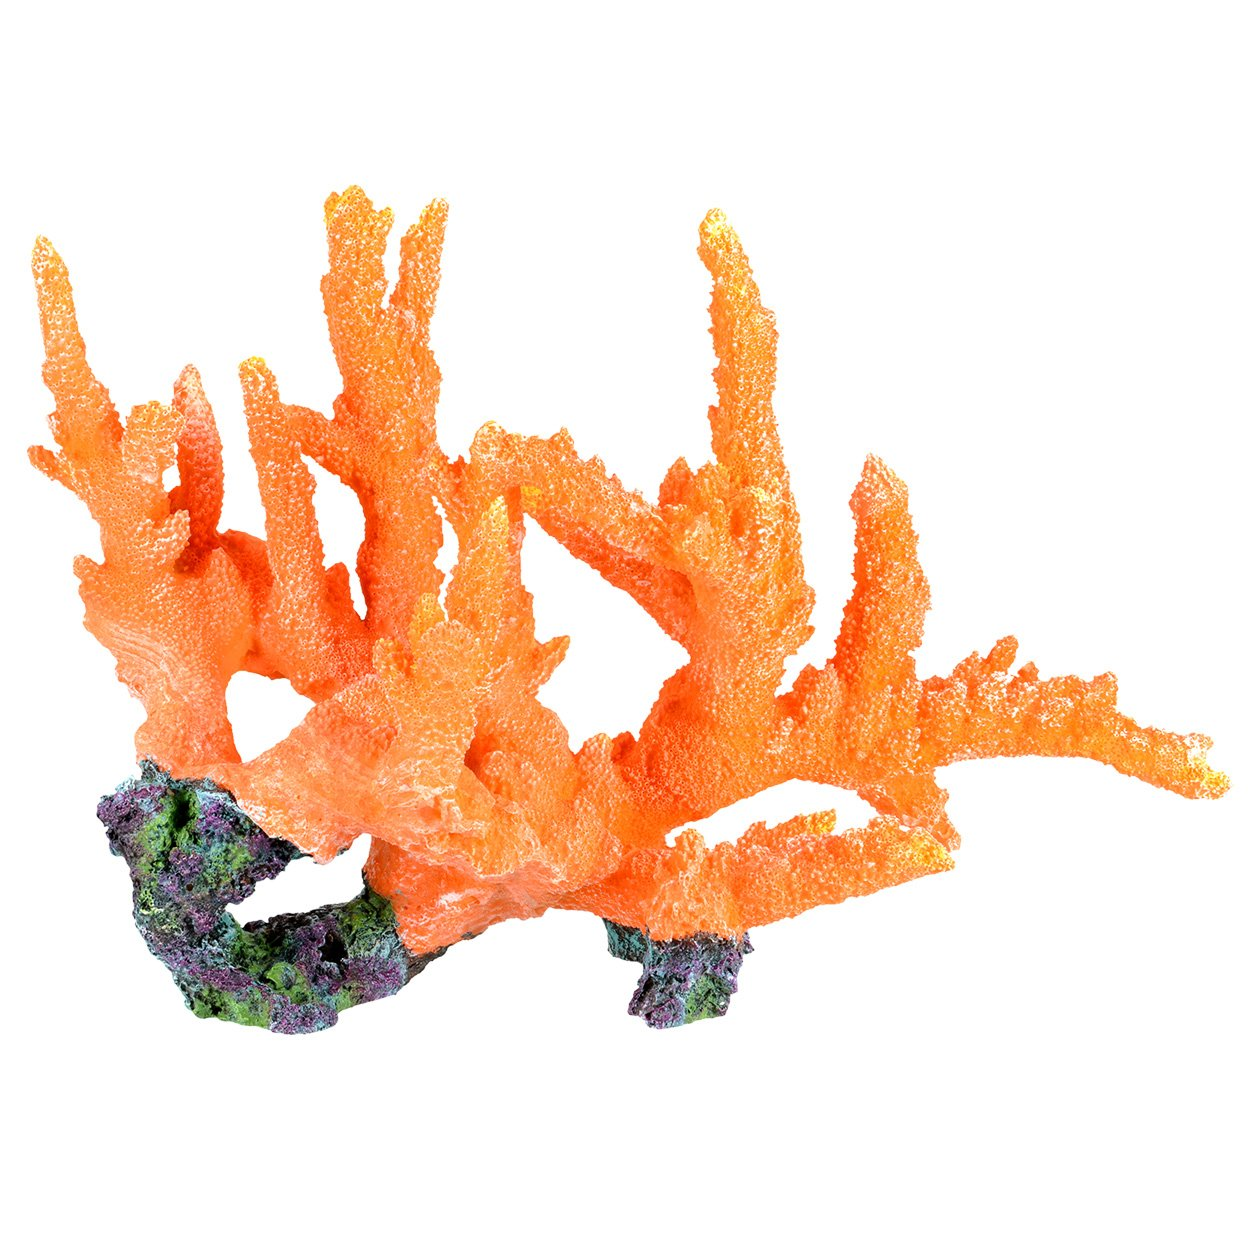 Underwater Treasures Branch Coral - Orange Show by Underwater Treasures